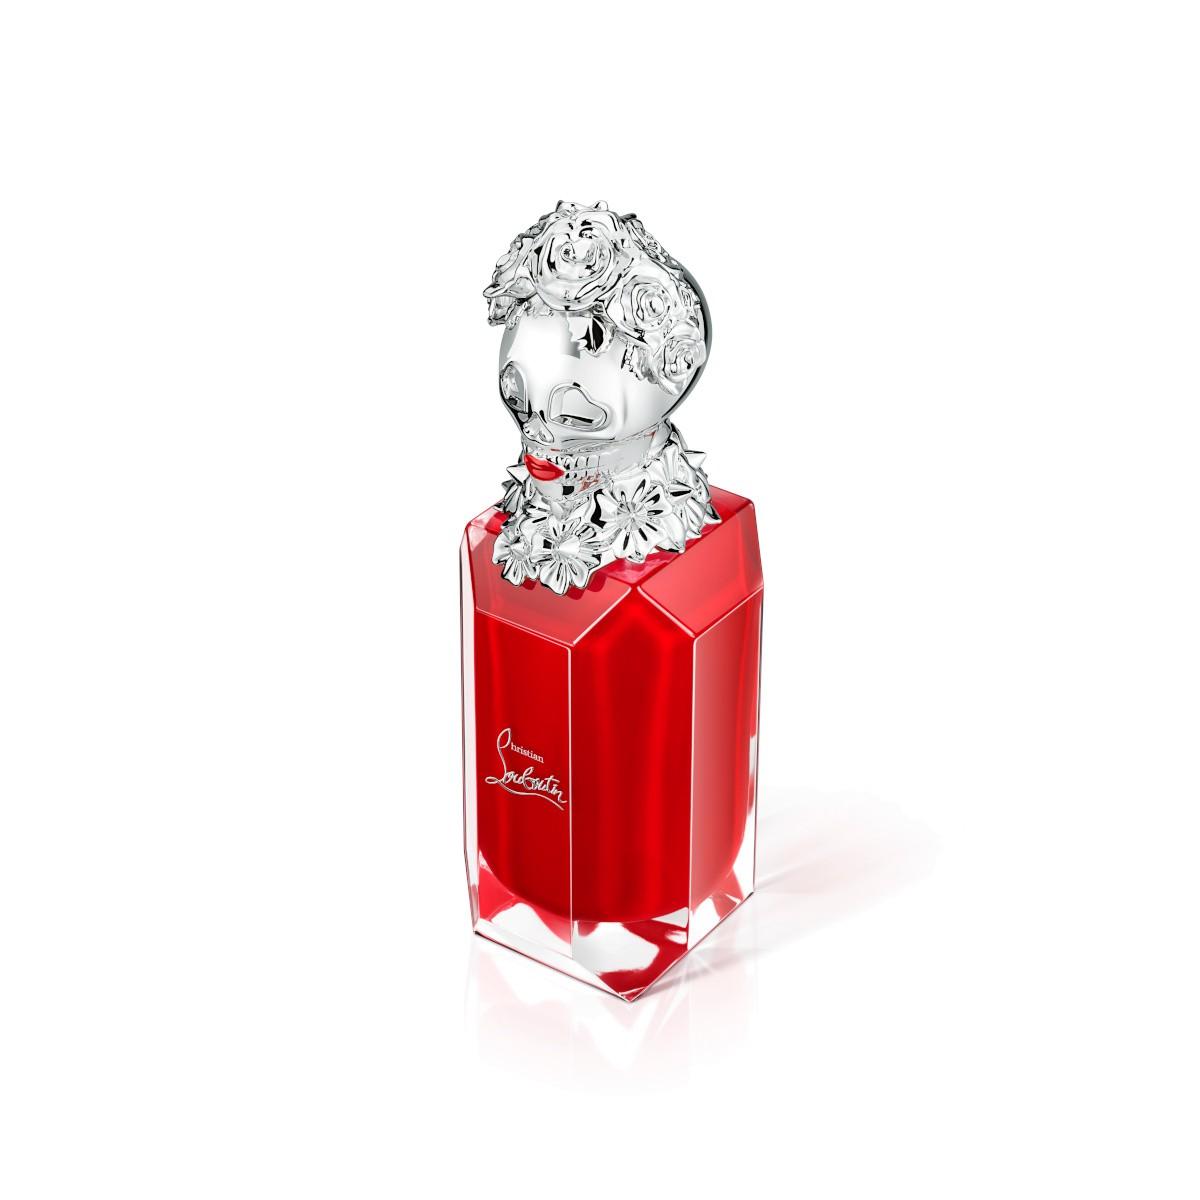 Beauty - Loubikiss Eau De Parfum - Christian Louboutin